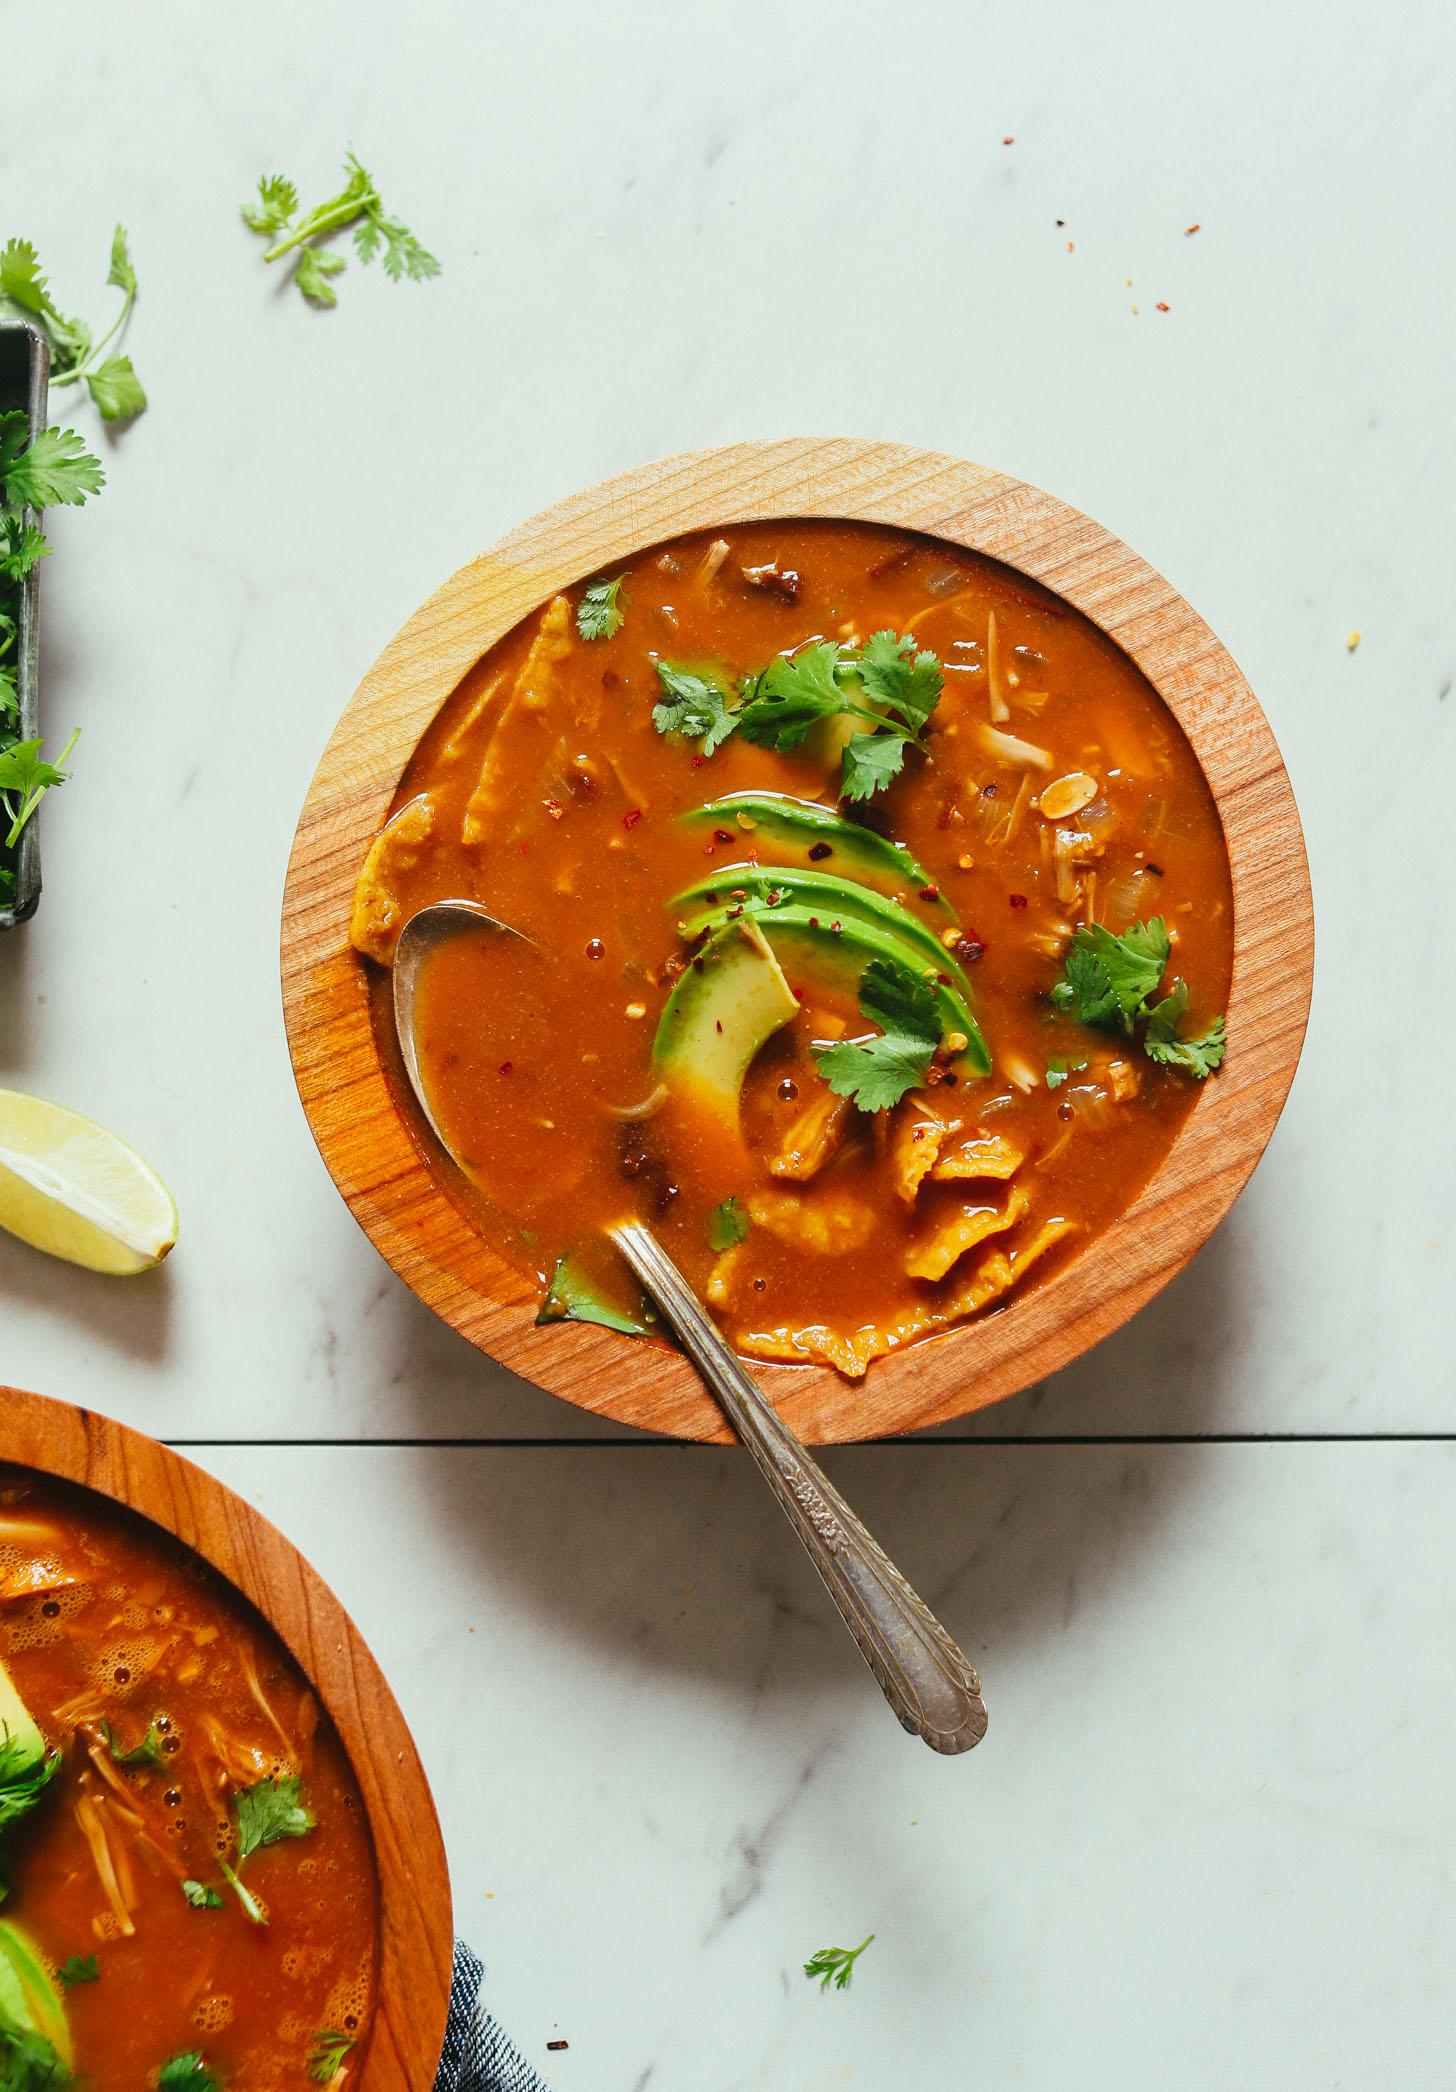 Overhead shot of a bowl of homemade Vegan Tortilla Soup with Jackfruit